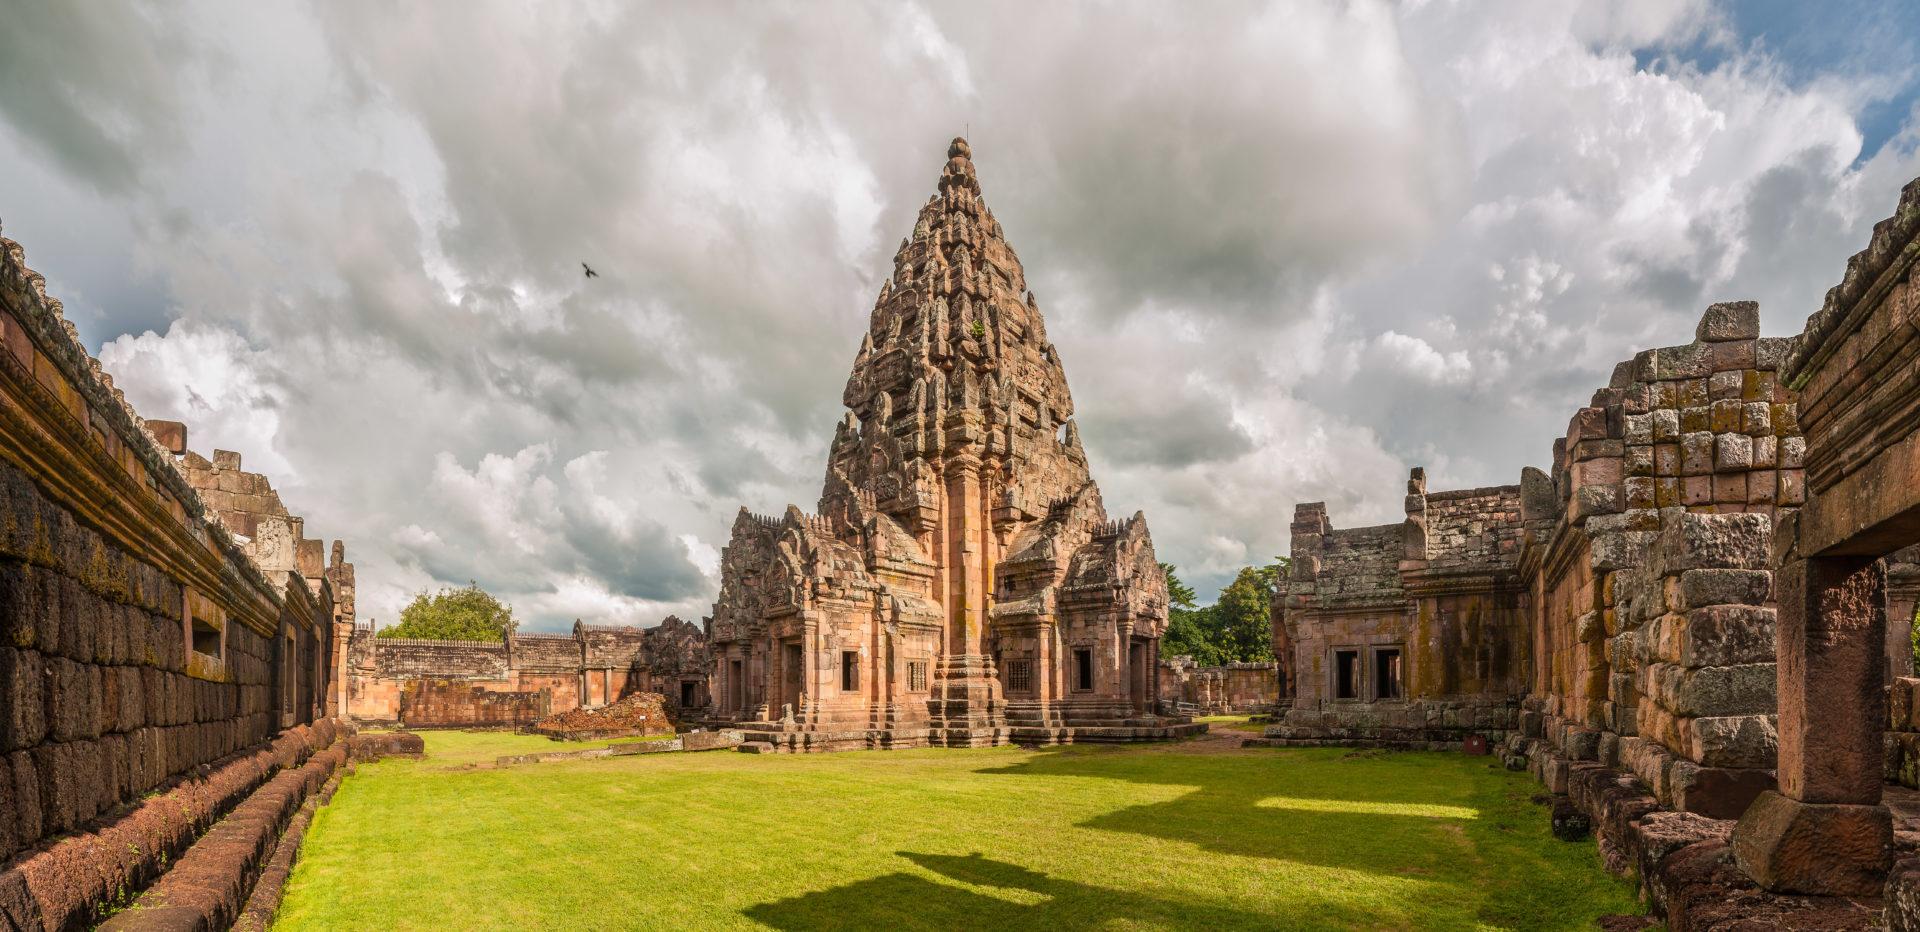 Kambodscha Kulturgüter